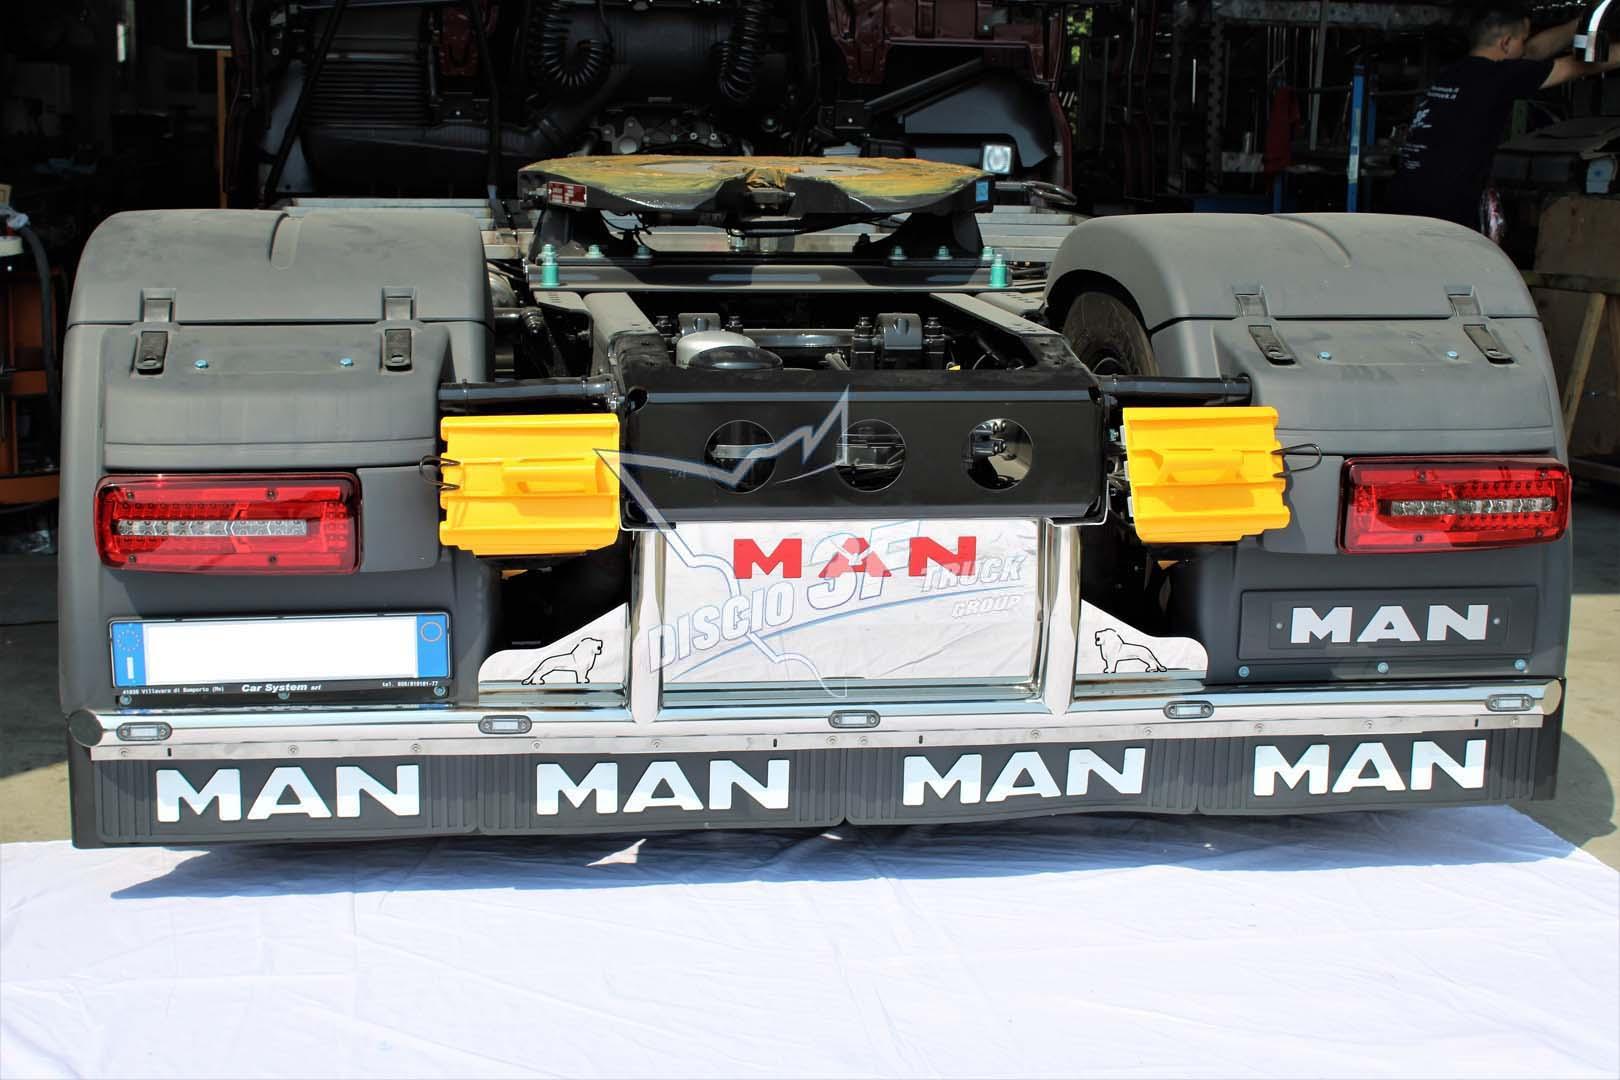 Palo Posteriore, Man E6